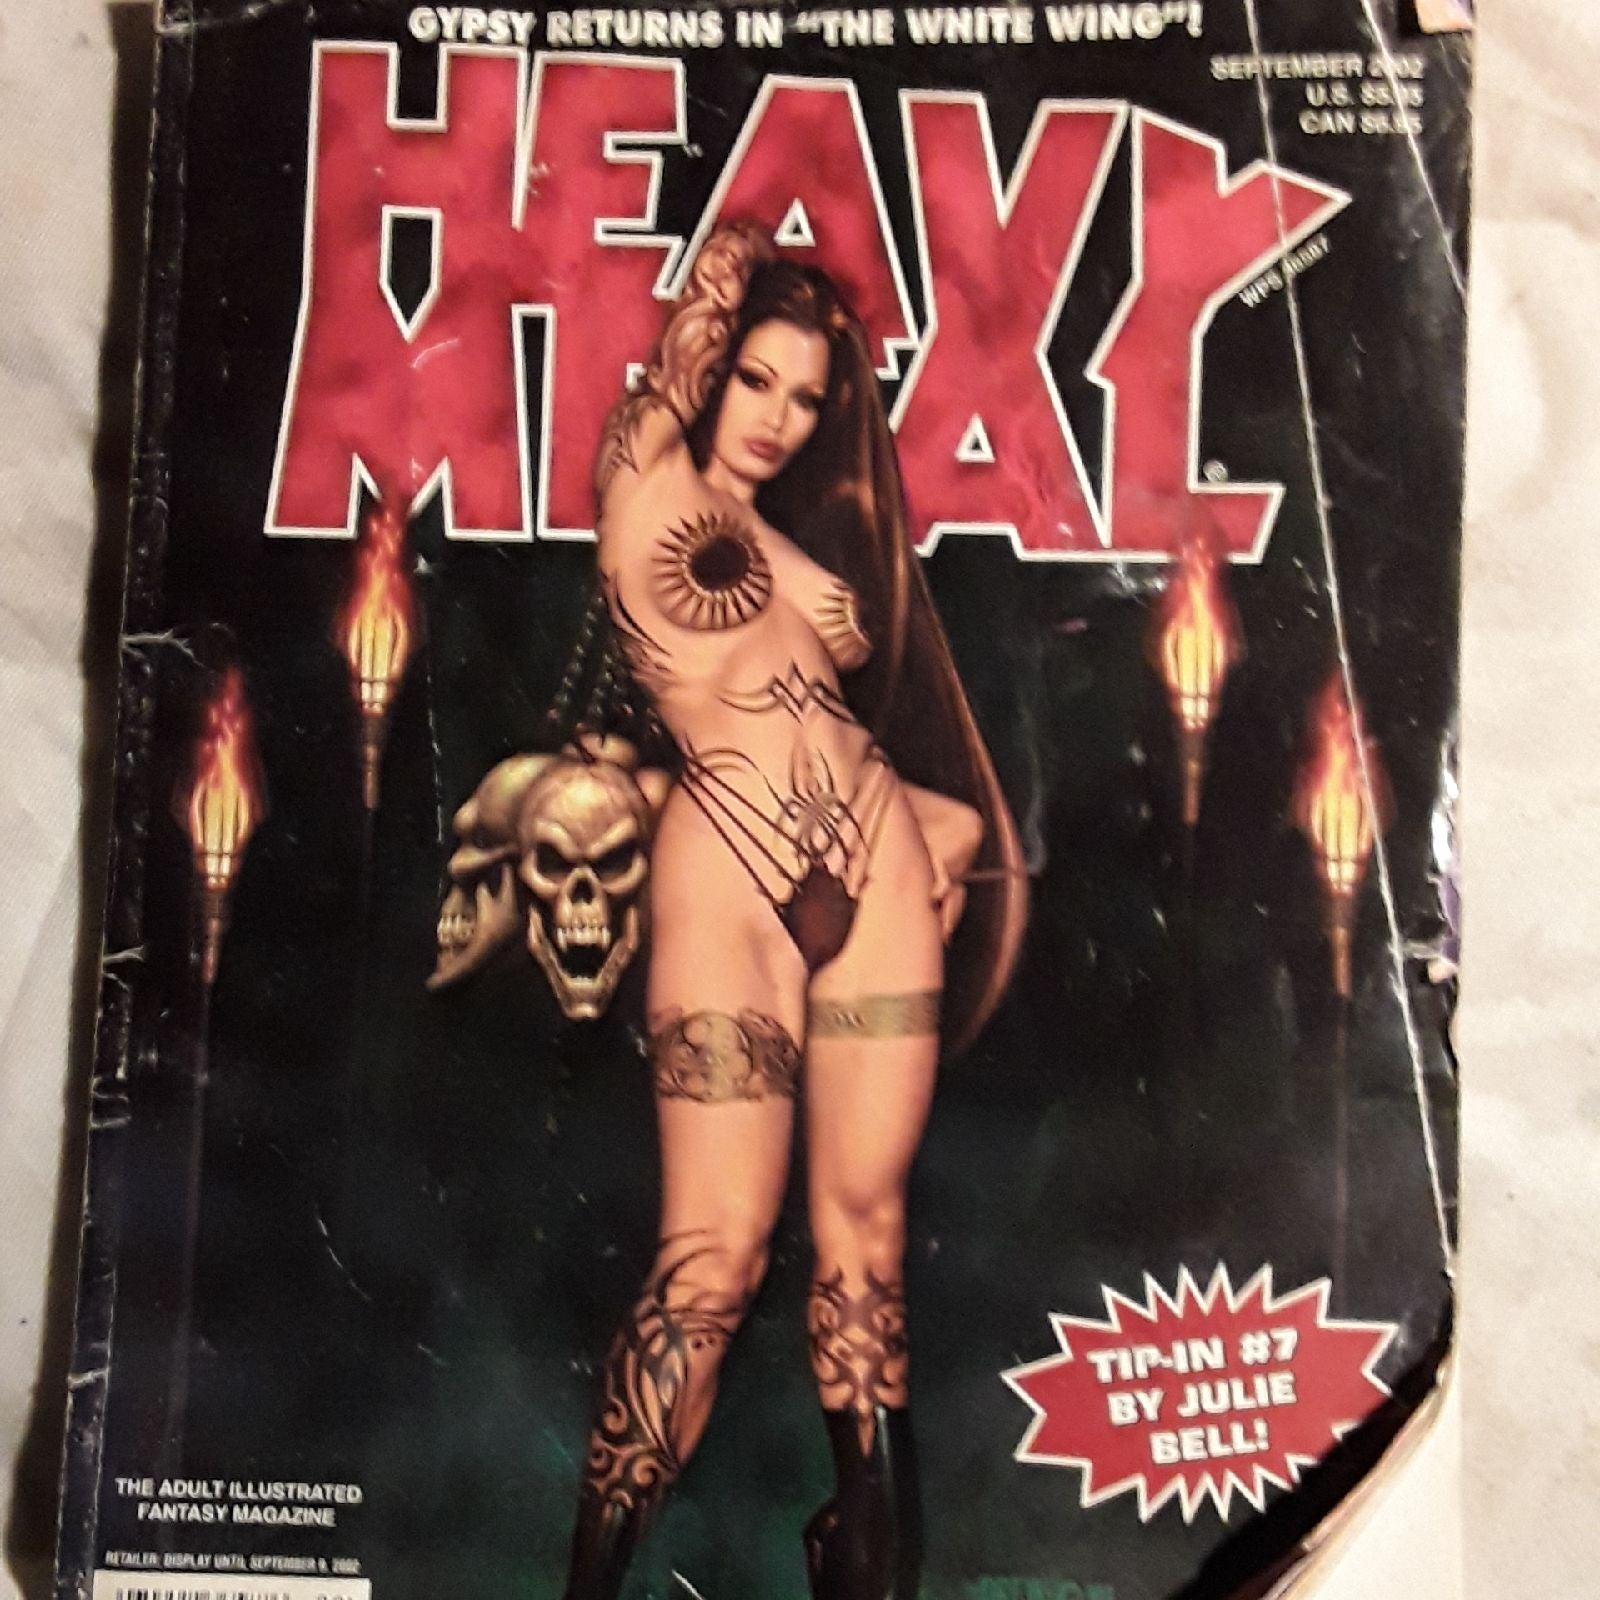 Heavy metal comics issue September 2002